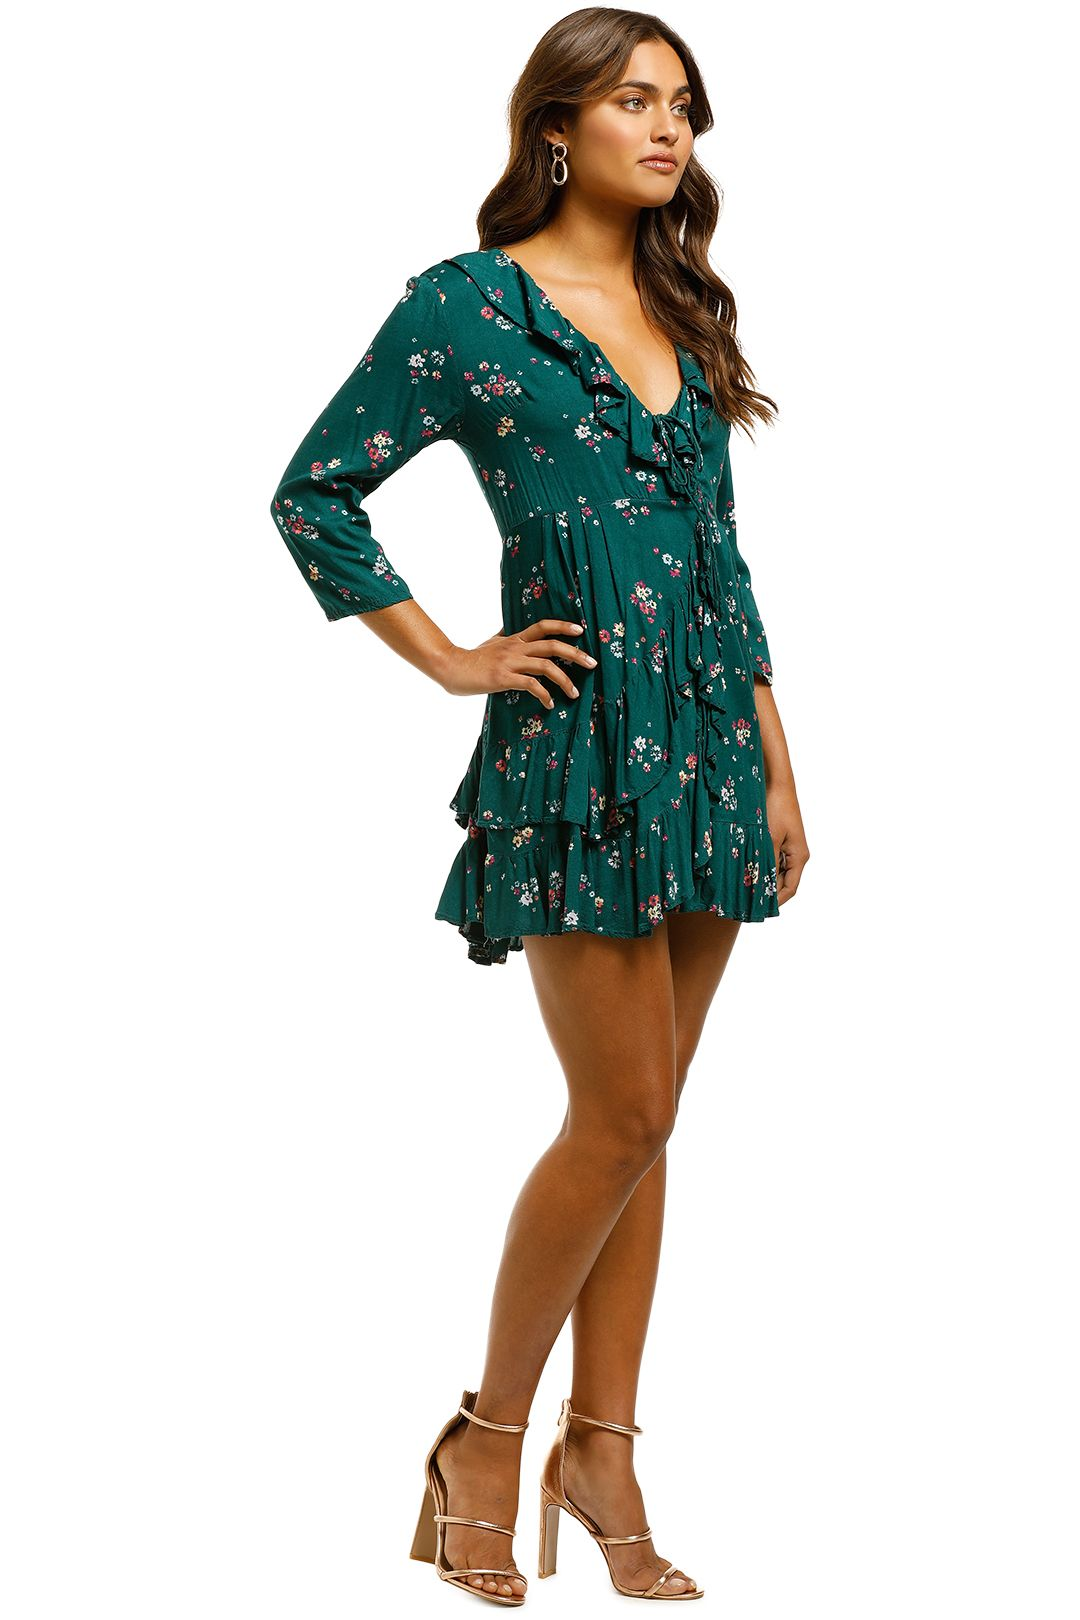 Auguste - Desert Dandelion Grace Mini Dress - Emerald - Side